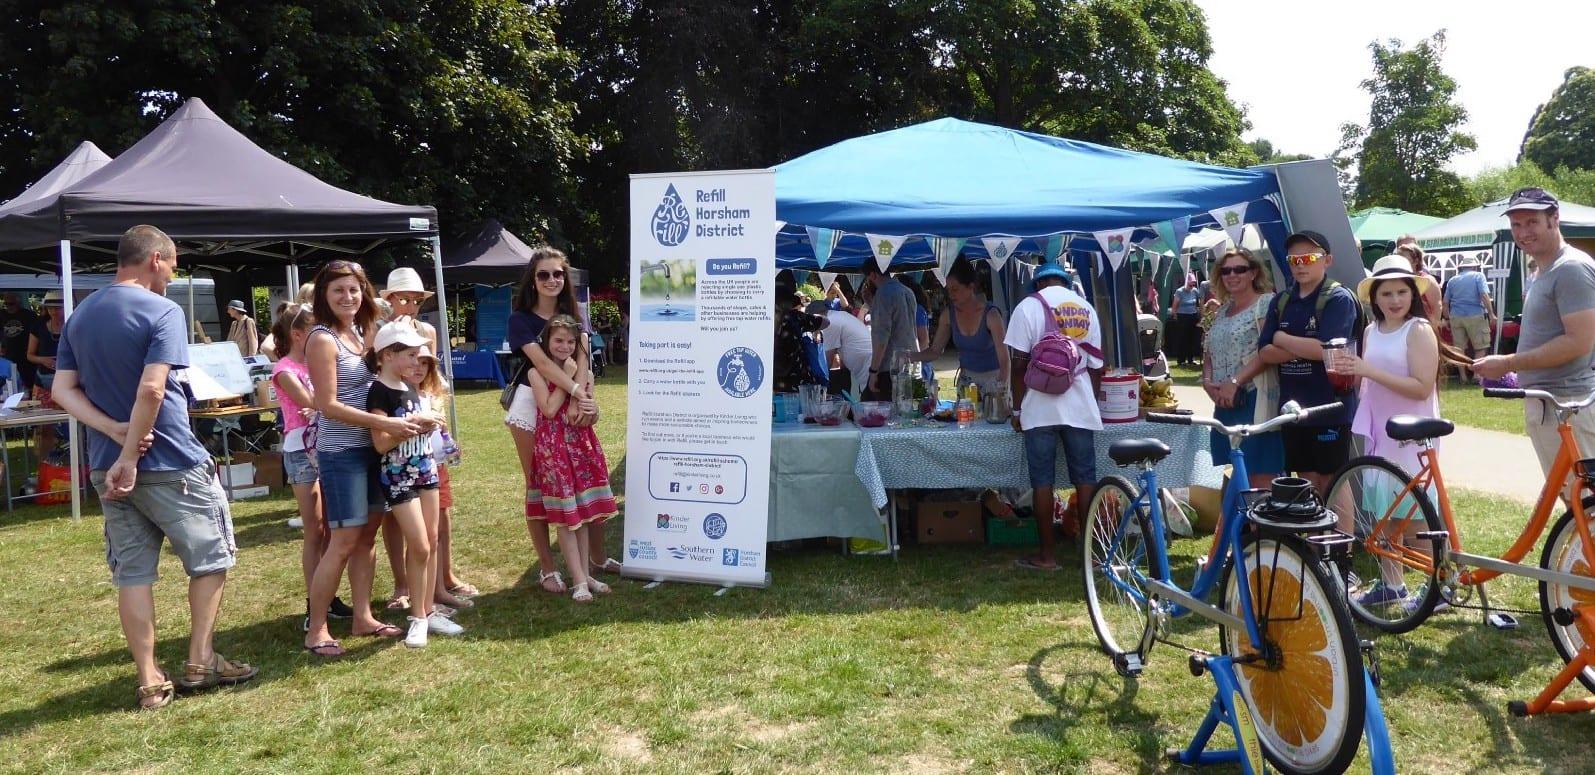 Refill Horsham District volunteer day